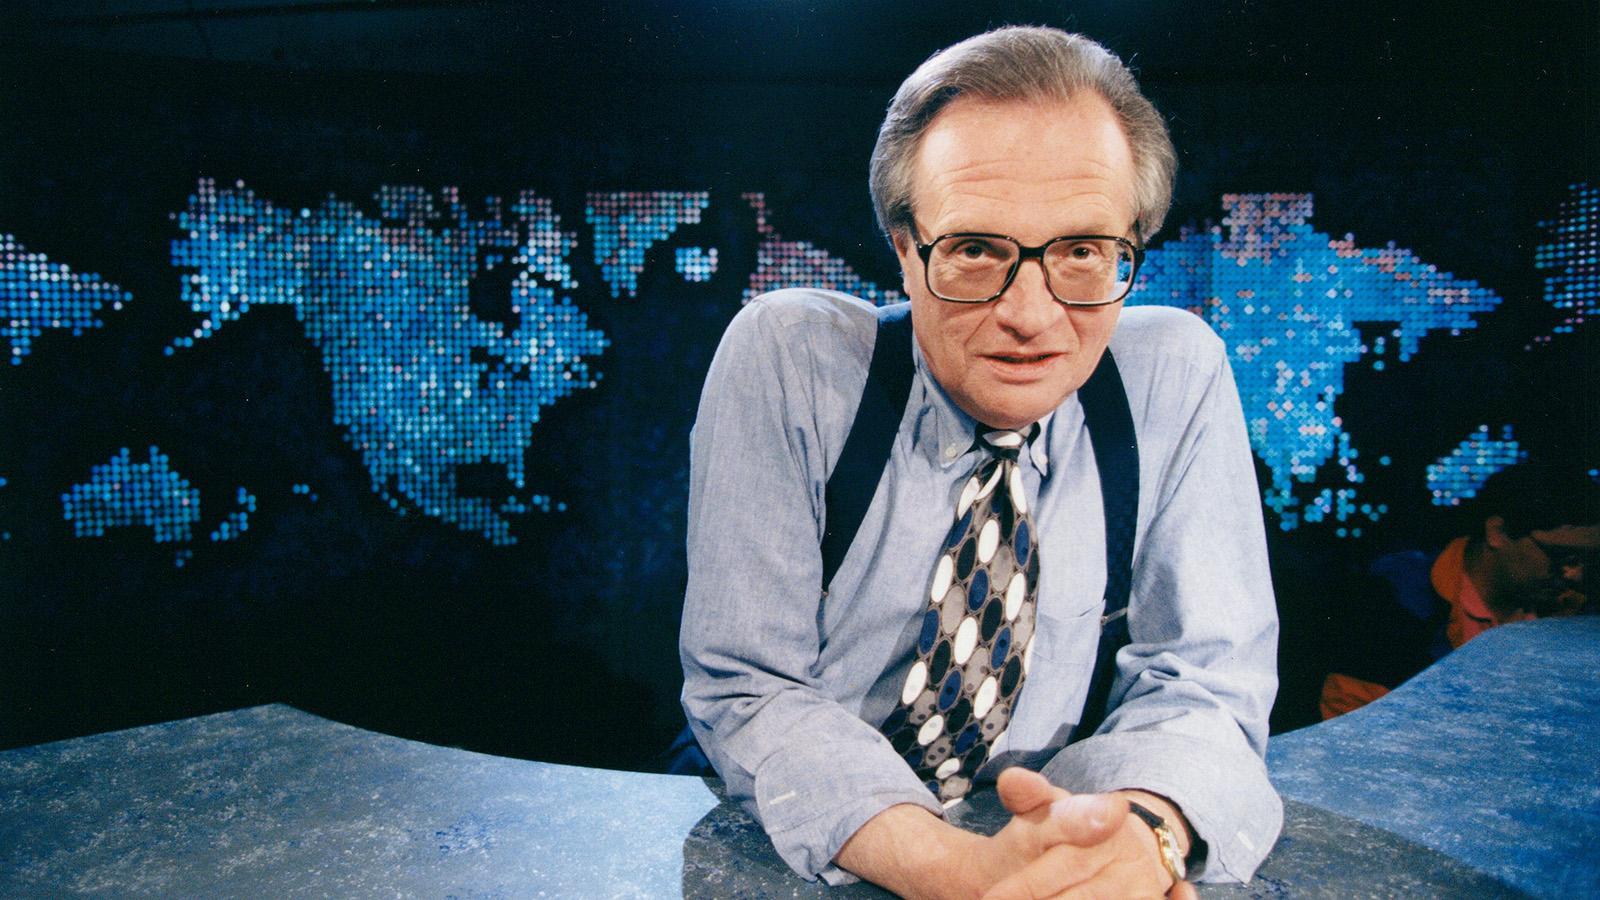 Larry King i CNN-studion i Atlanta på 90-talet.